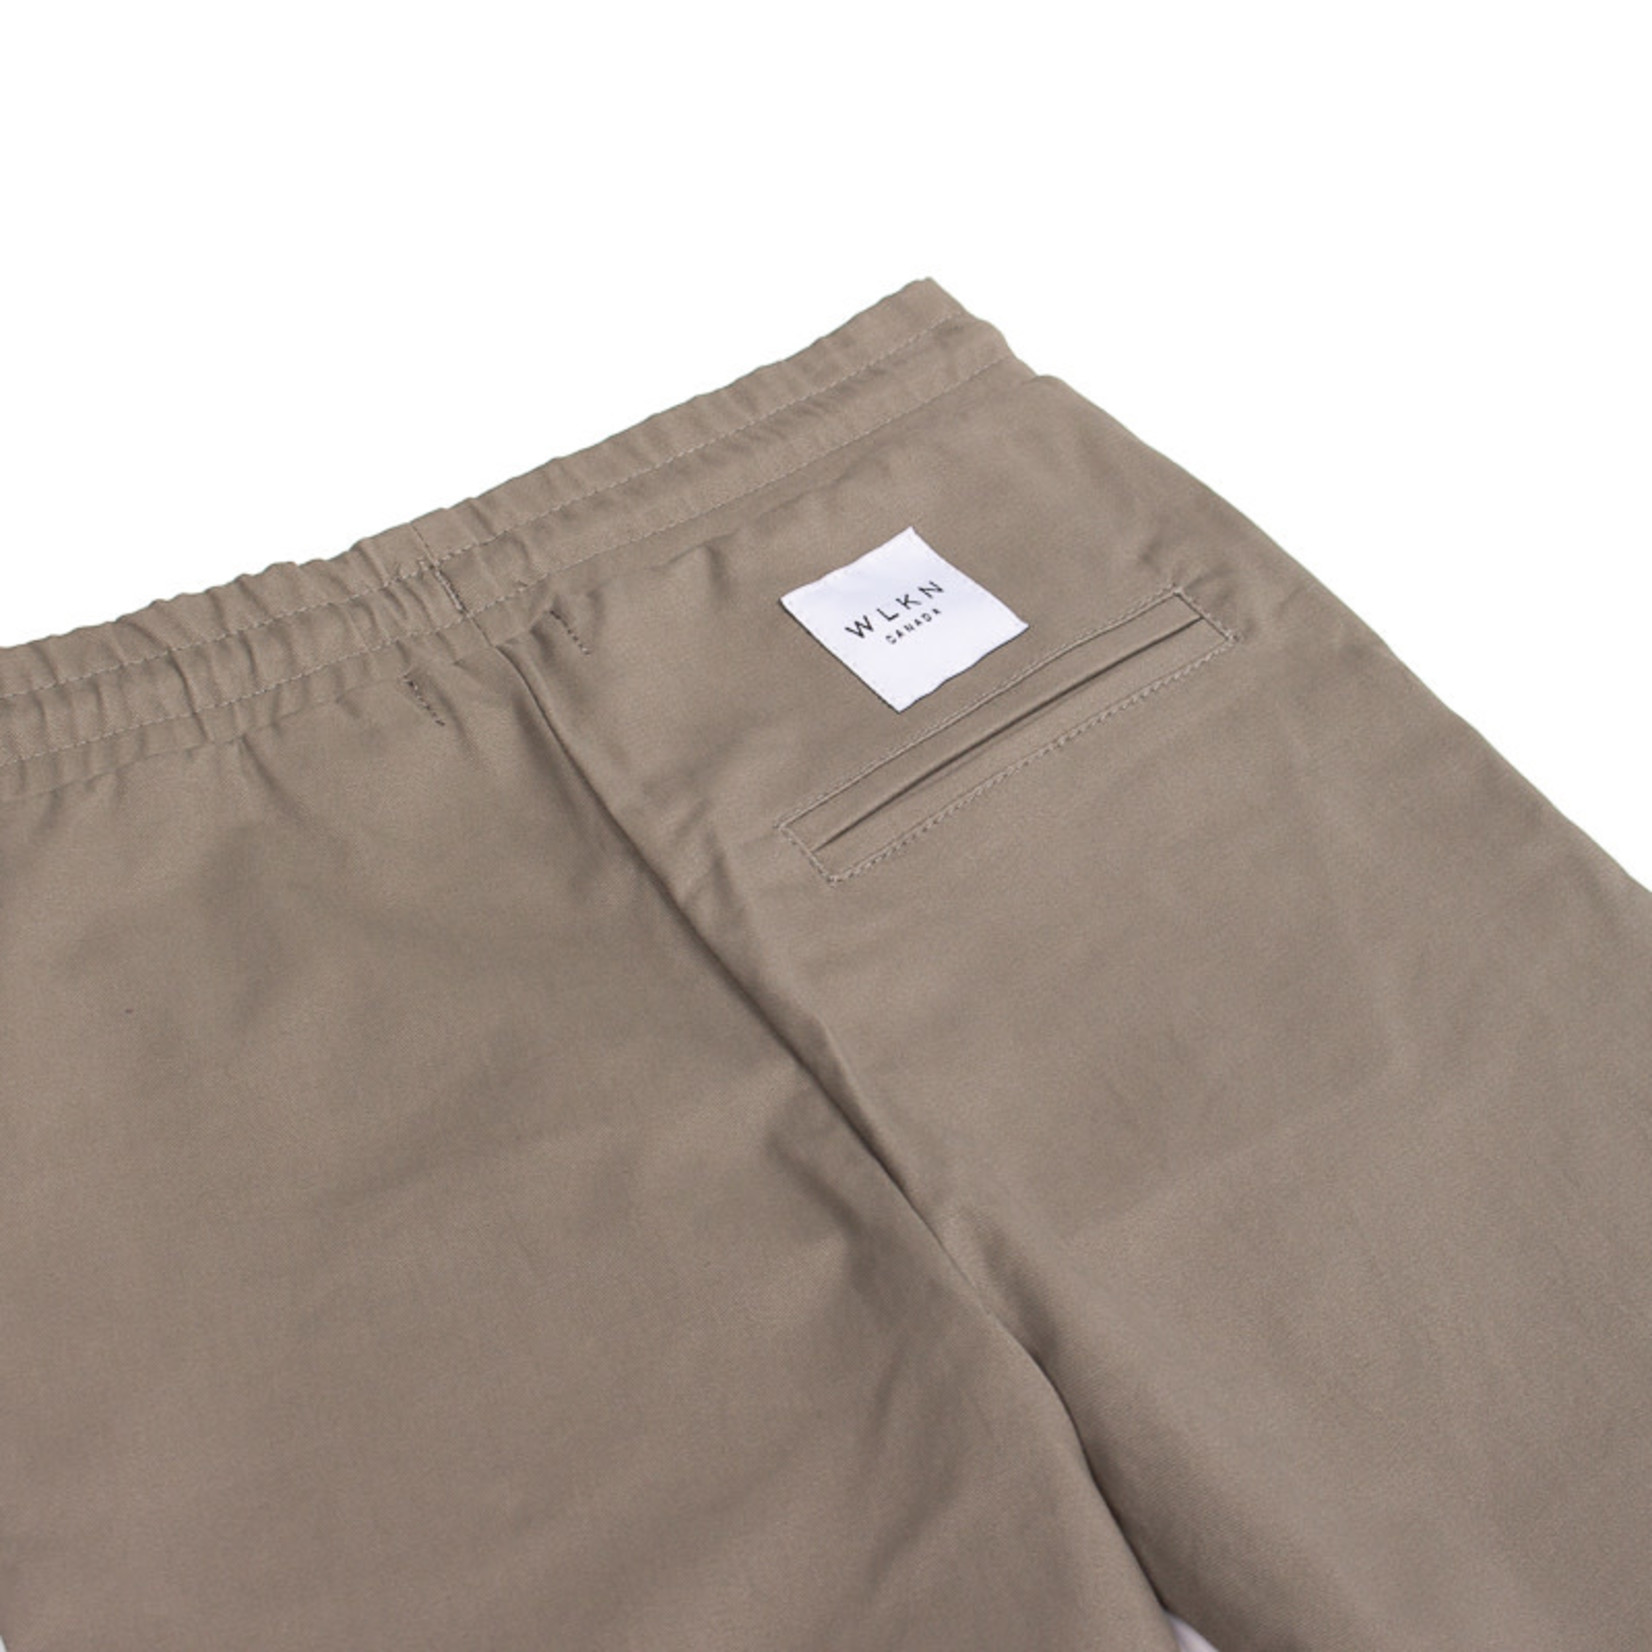 WLKN WLKN : Junior Essential Jogger Pants